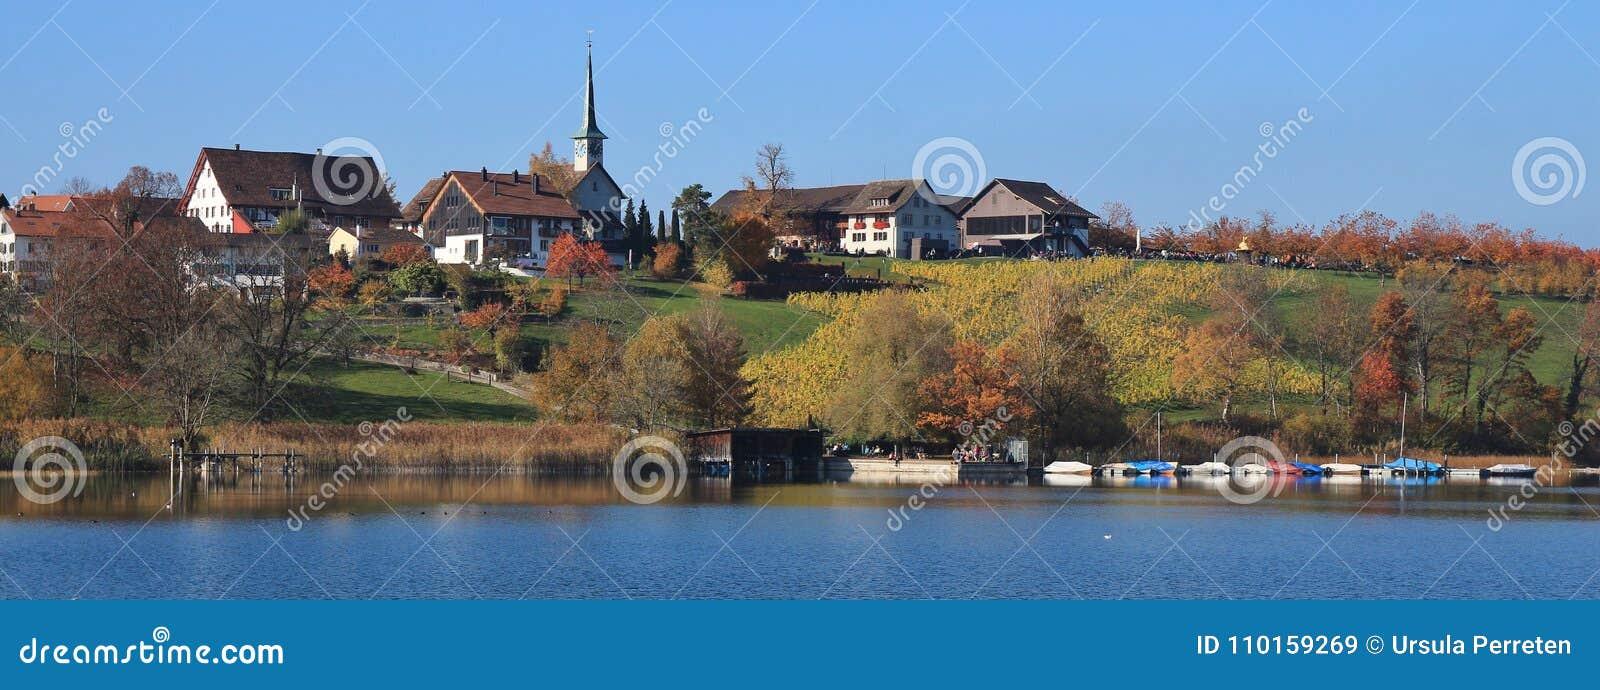 Seegraben, village on the shore of lake Pfaffikon. Colorful tree